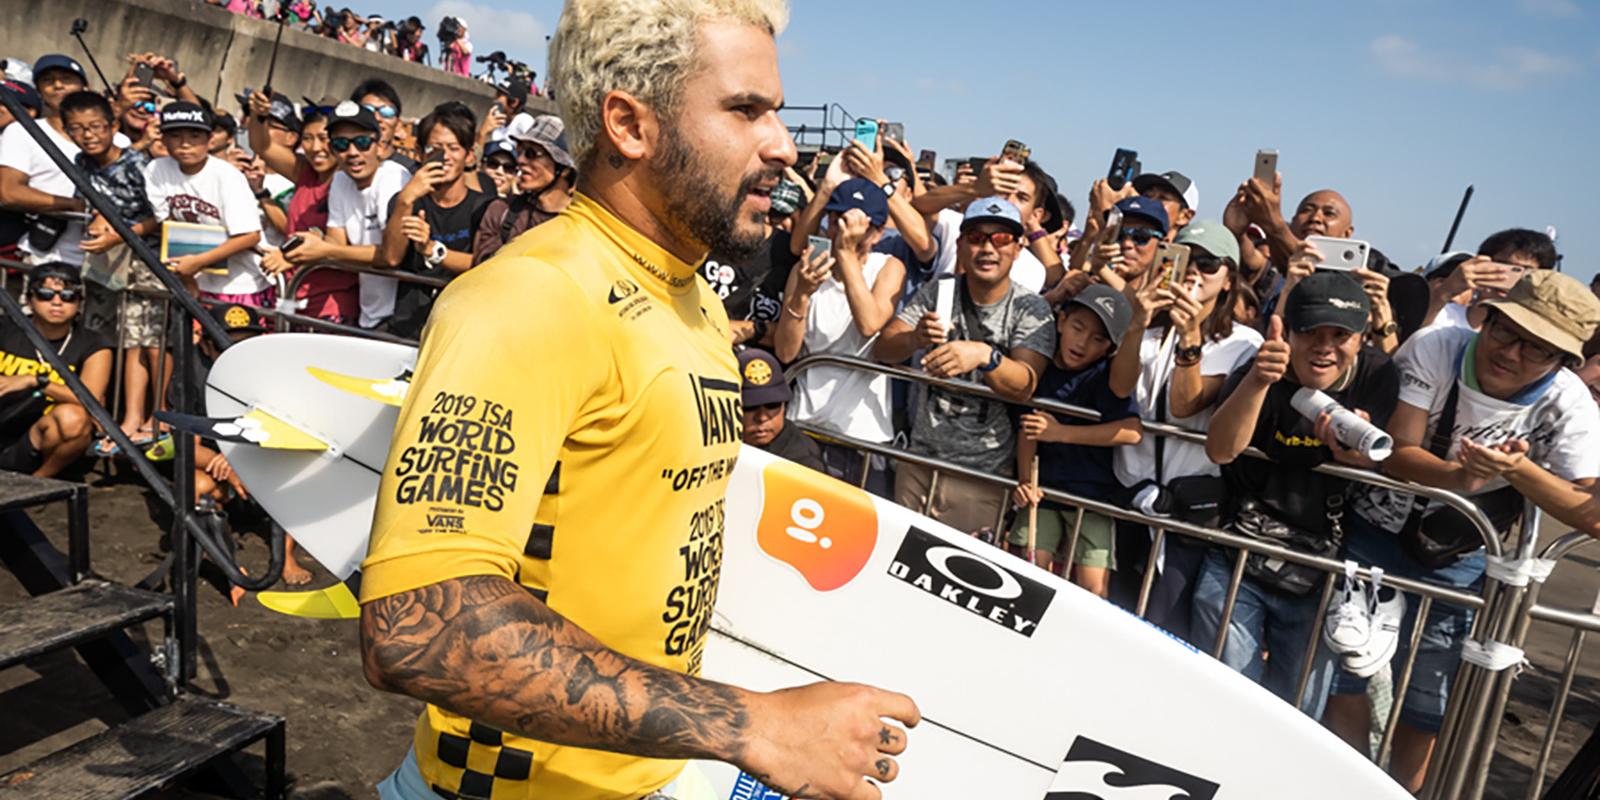 Brazil's Italo Ferreira will headline team Brazil as he defends his 2019 World Surfing Games Men's Gold Medal. Photo: ISA / Sean Evans